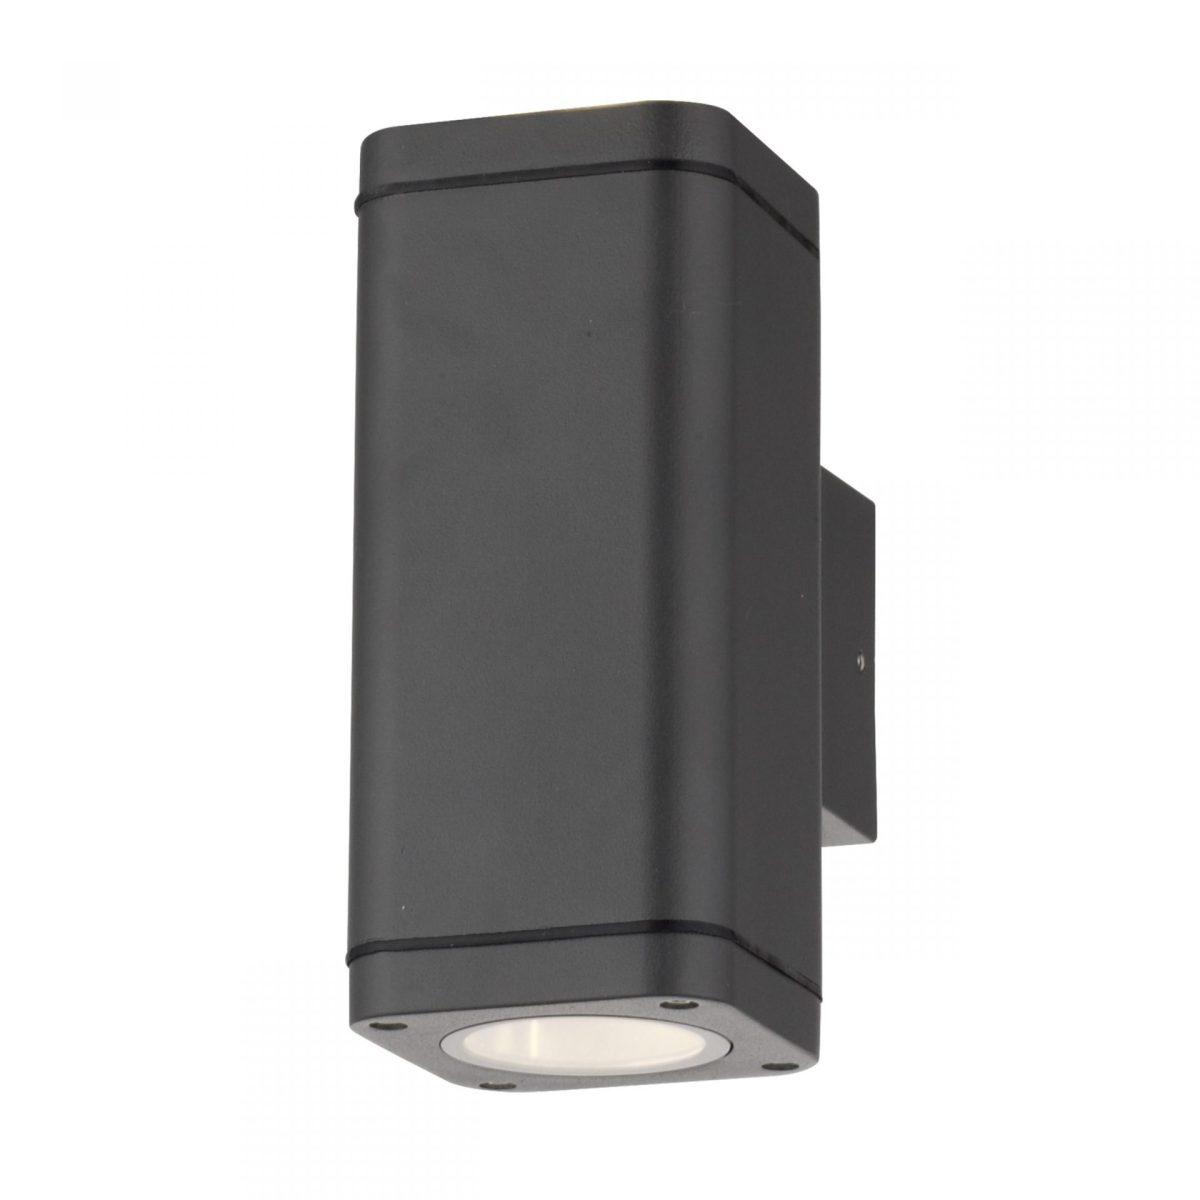 Outdoor Lighting Waterproof Wall Light WL-B6 – COMING SOON